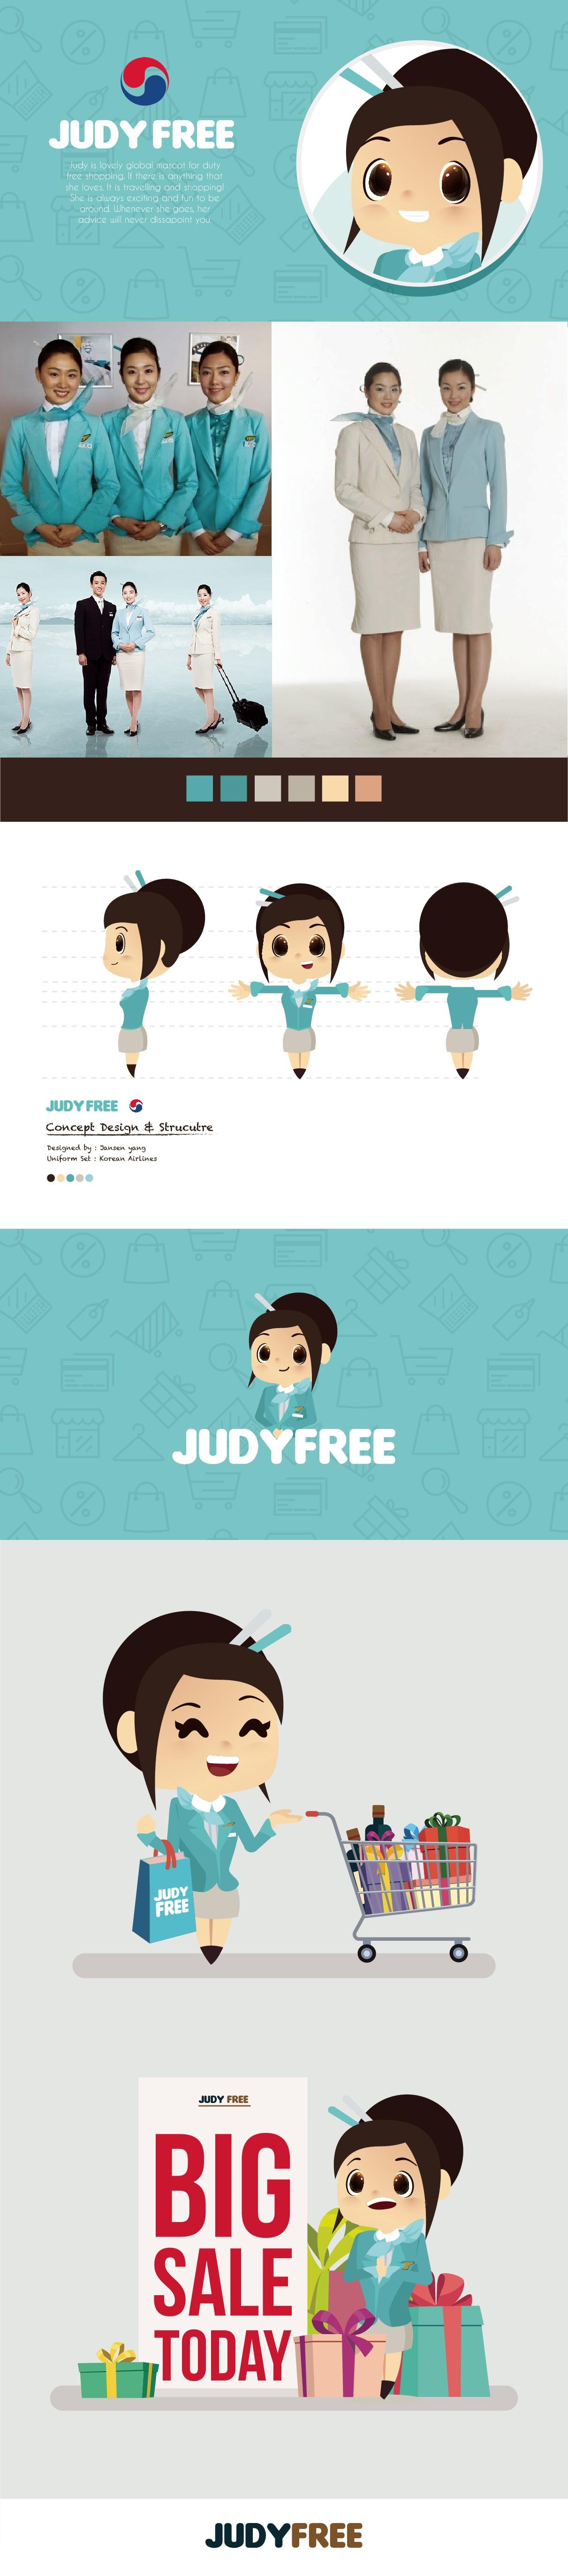 Judy Free - Cabin Crew